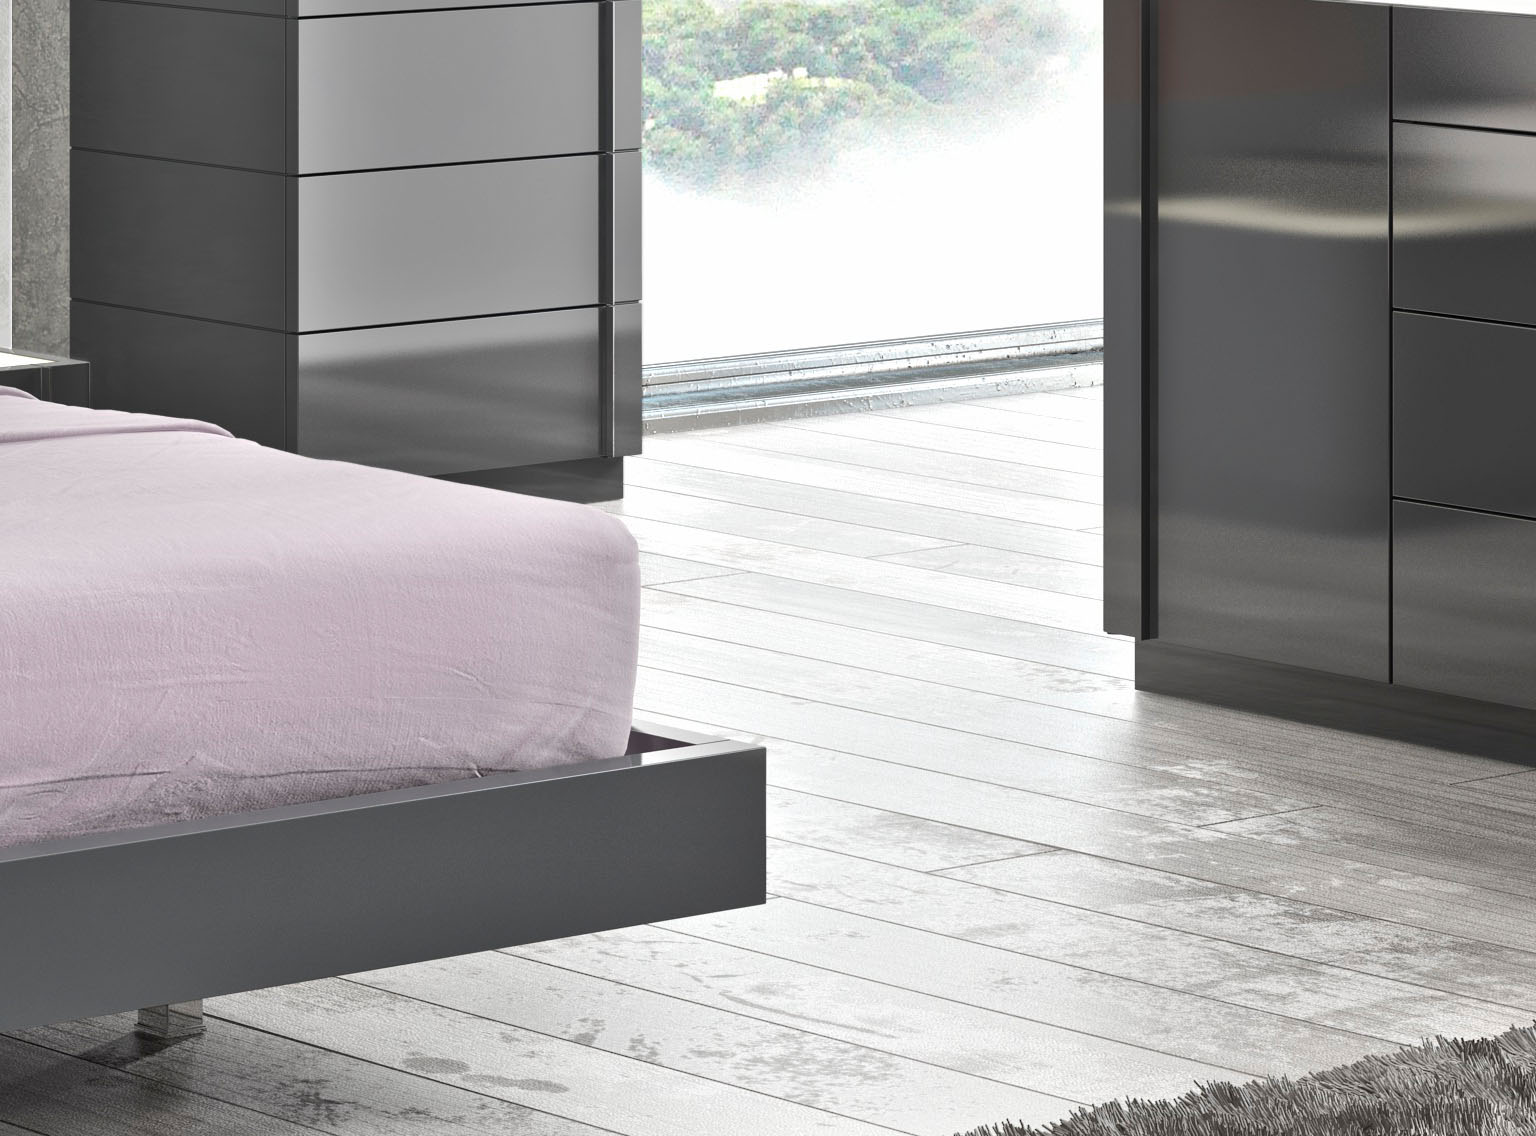 lacquered stylish wood elite platform bed with long panels. Black Bedroom Furniture Sets. Home Design Ideas